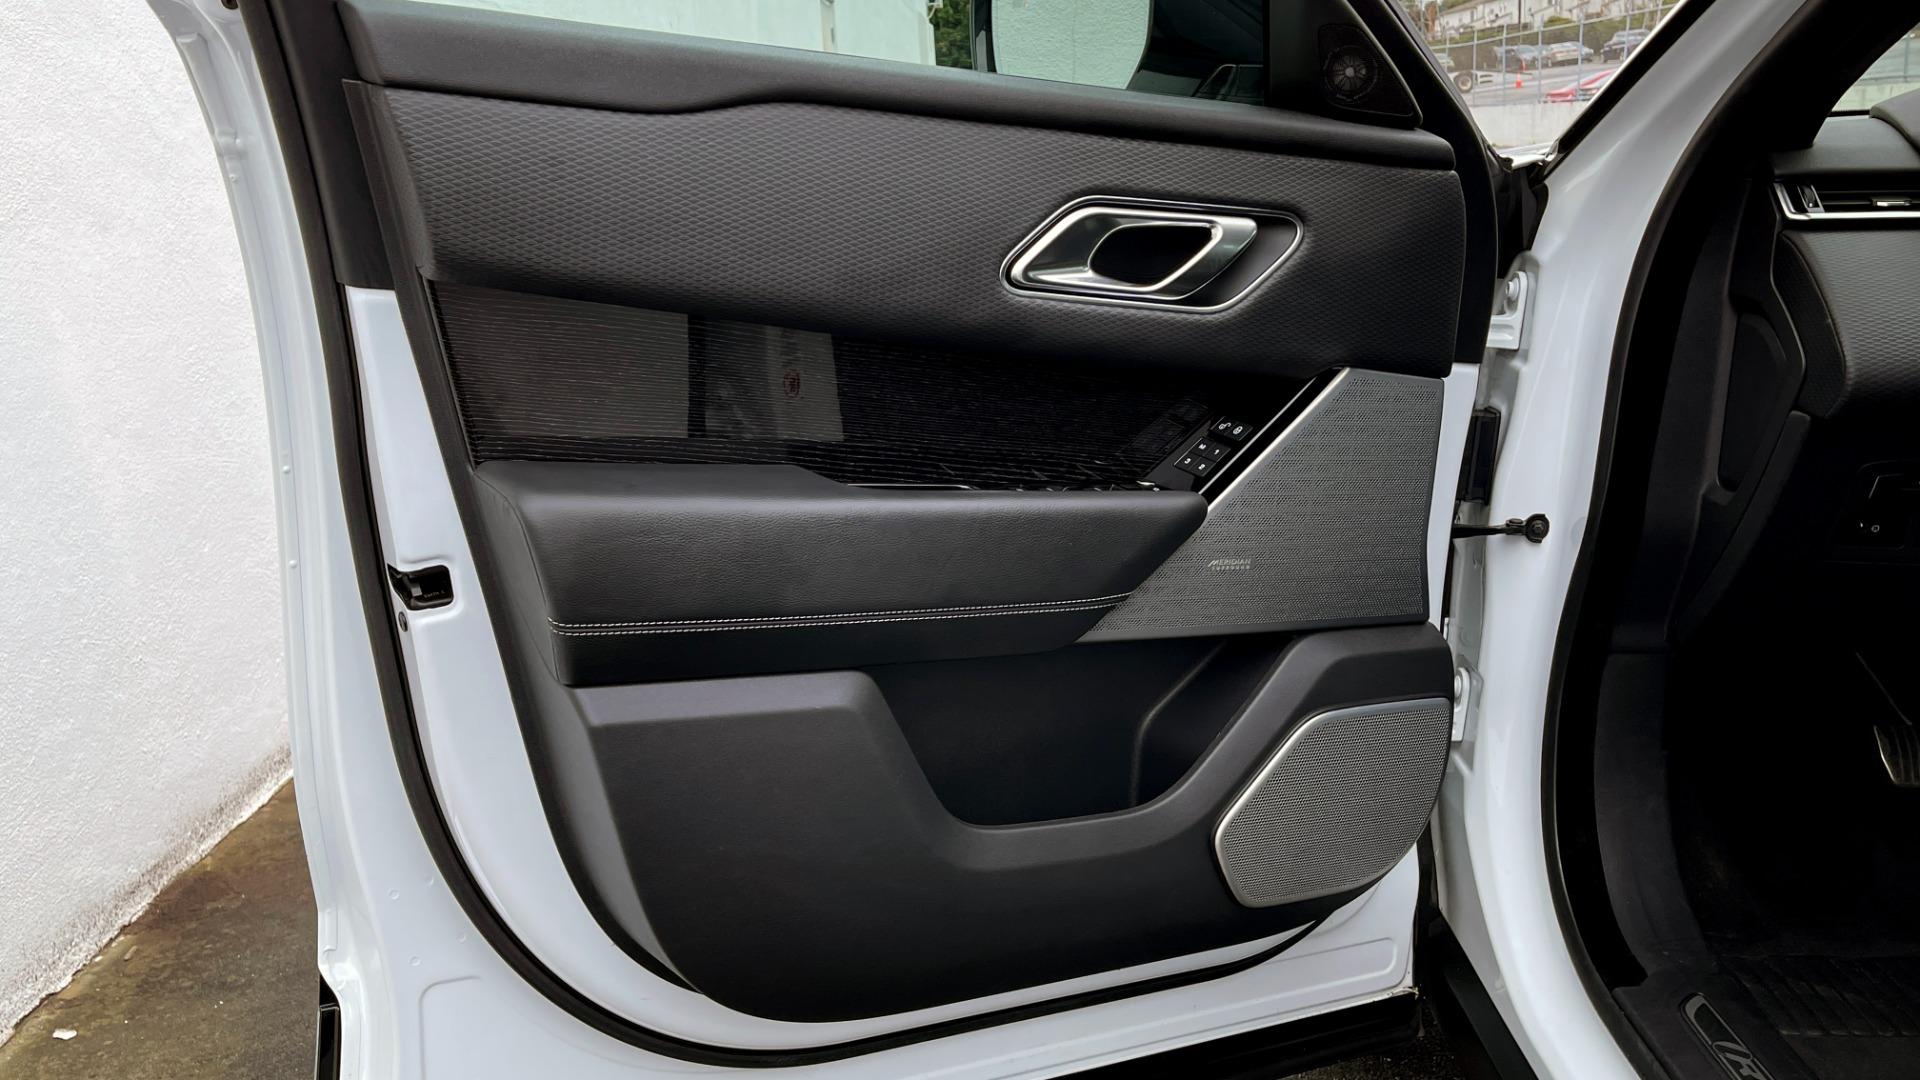 Used 2018 Land Rover RANGE ROVER VELAR R-DYNAMIC SE / NAV / PREM / MERIDIAN / SUNROOF / REARVIEW for sale $54,995 at Formula Imports in Charlotte NC 28227 25